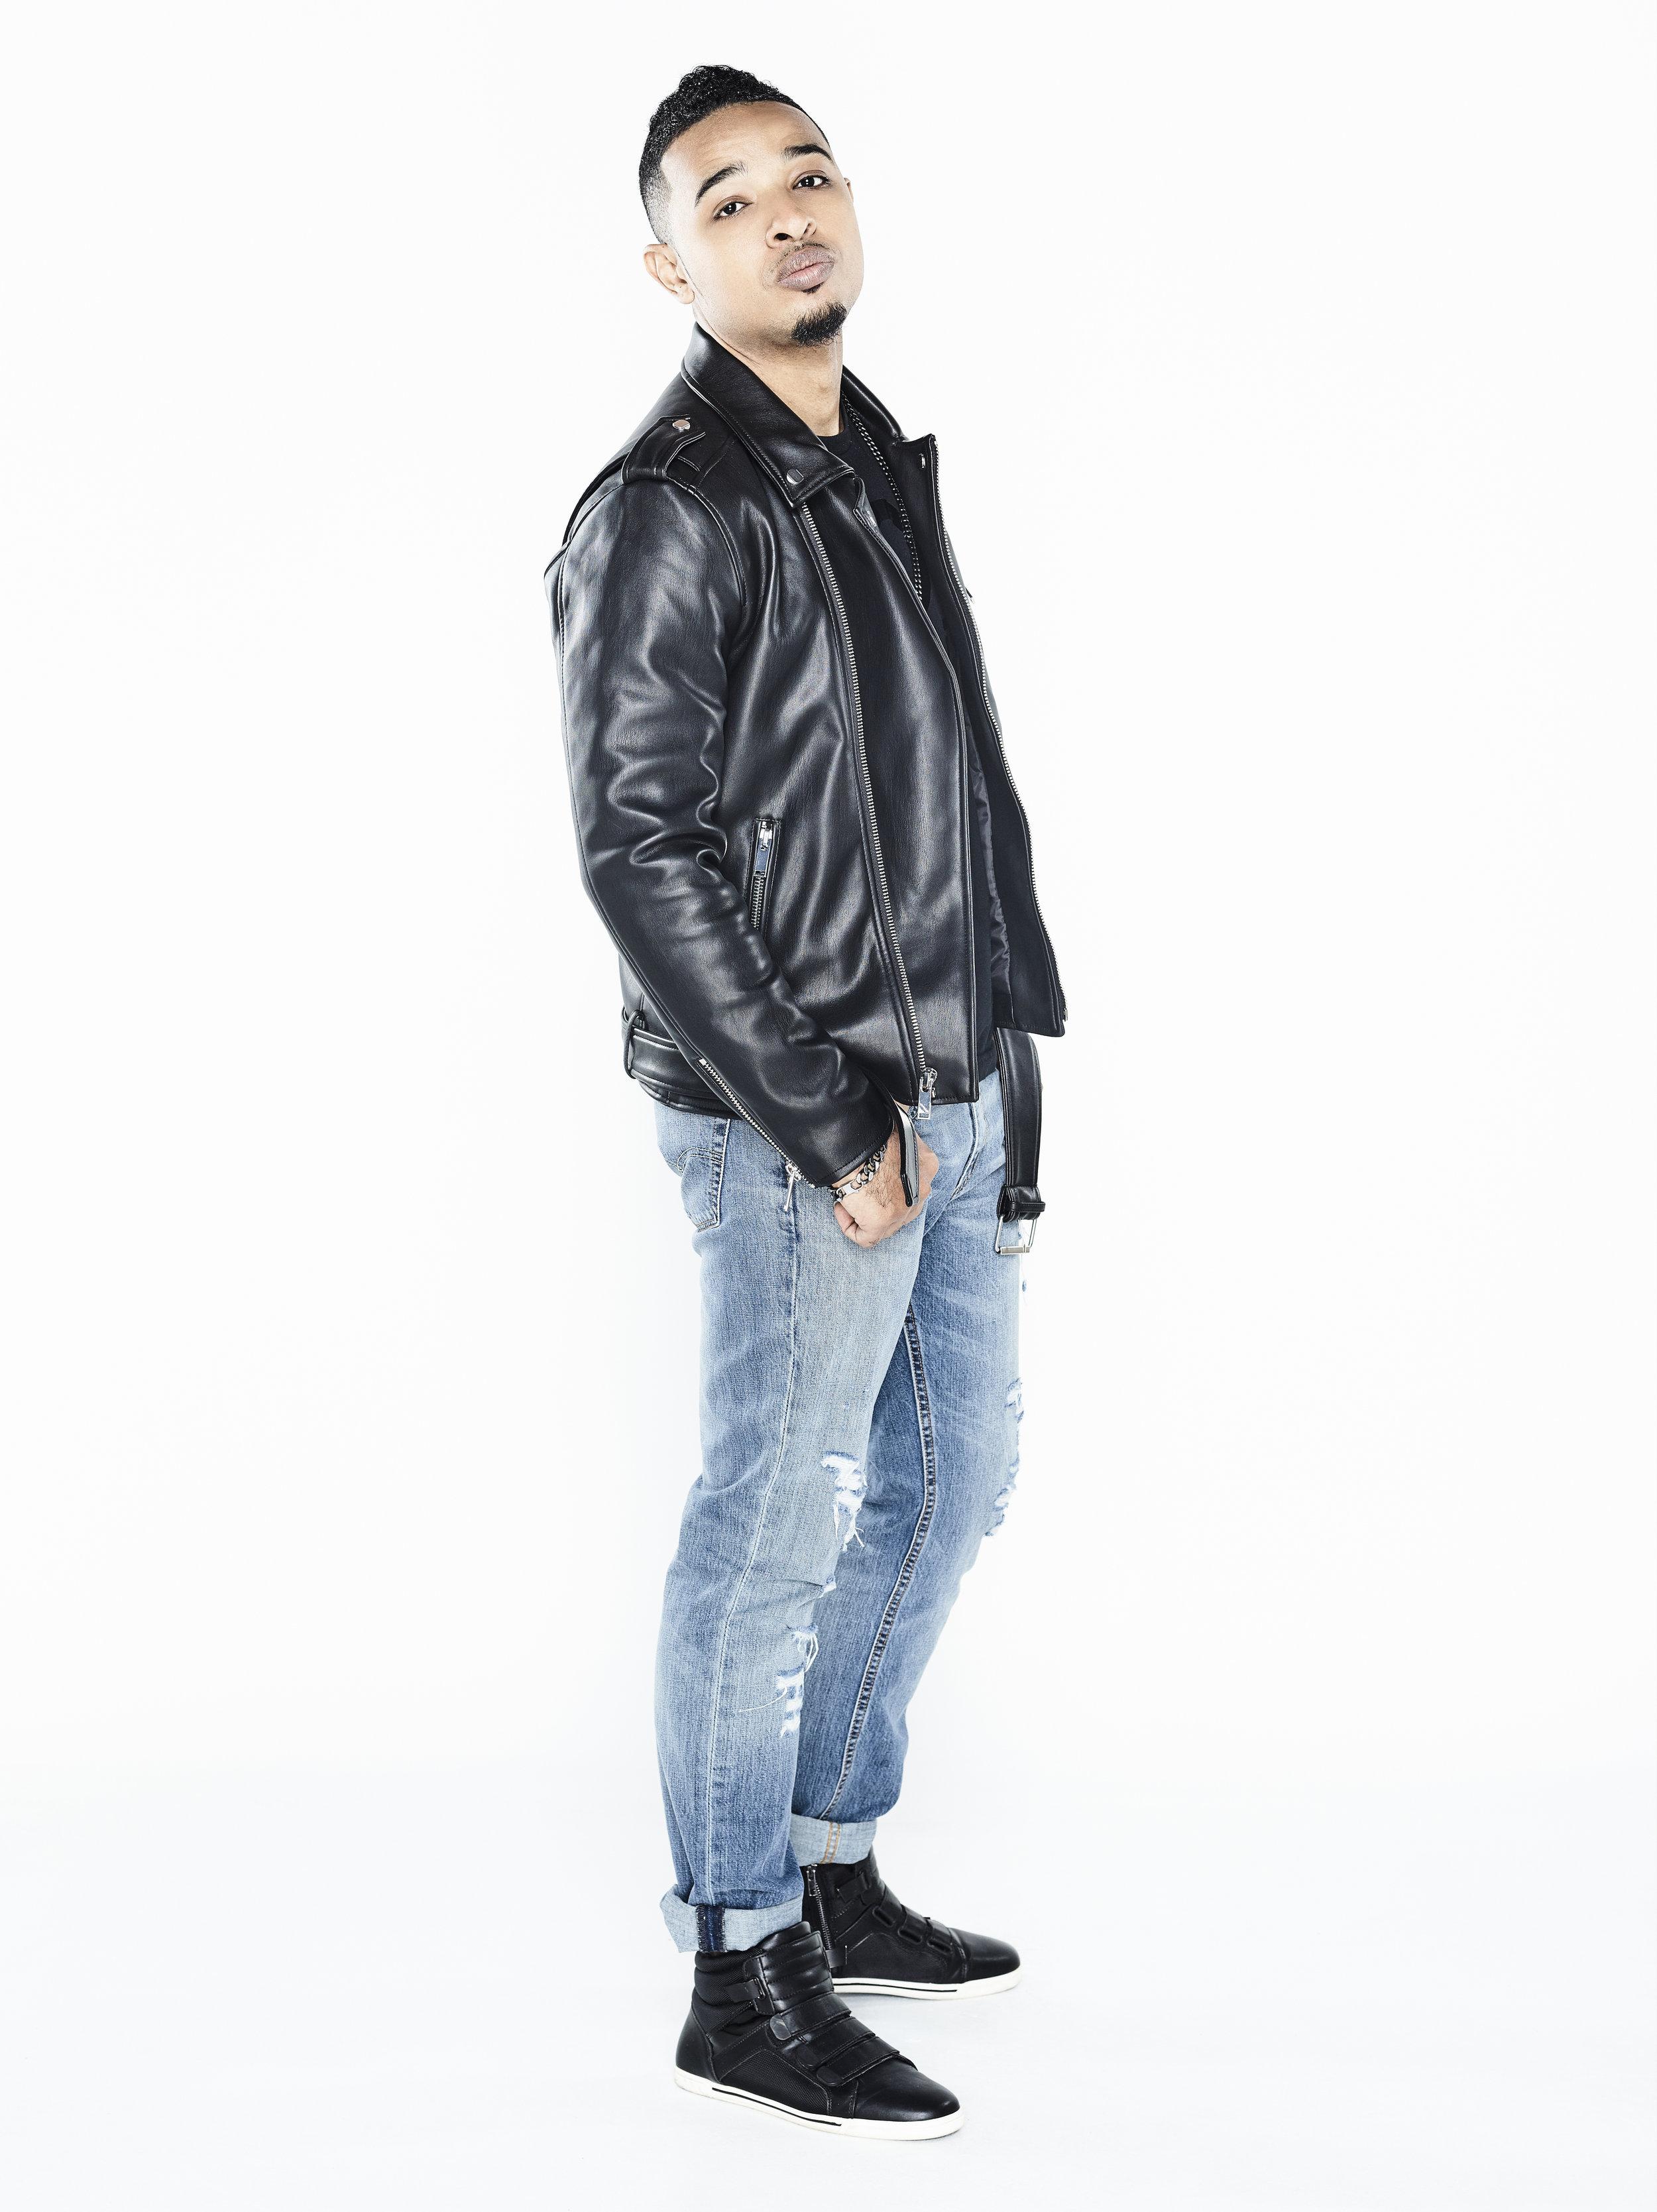 2016 Pic - DJ Nic smaller size 2.jpg